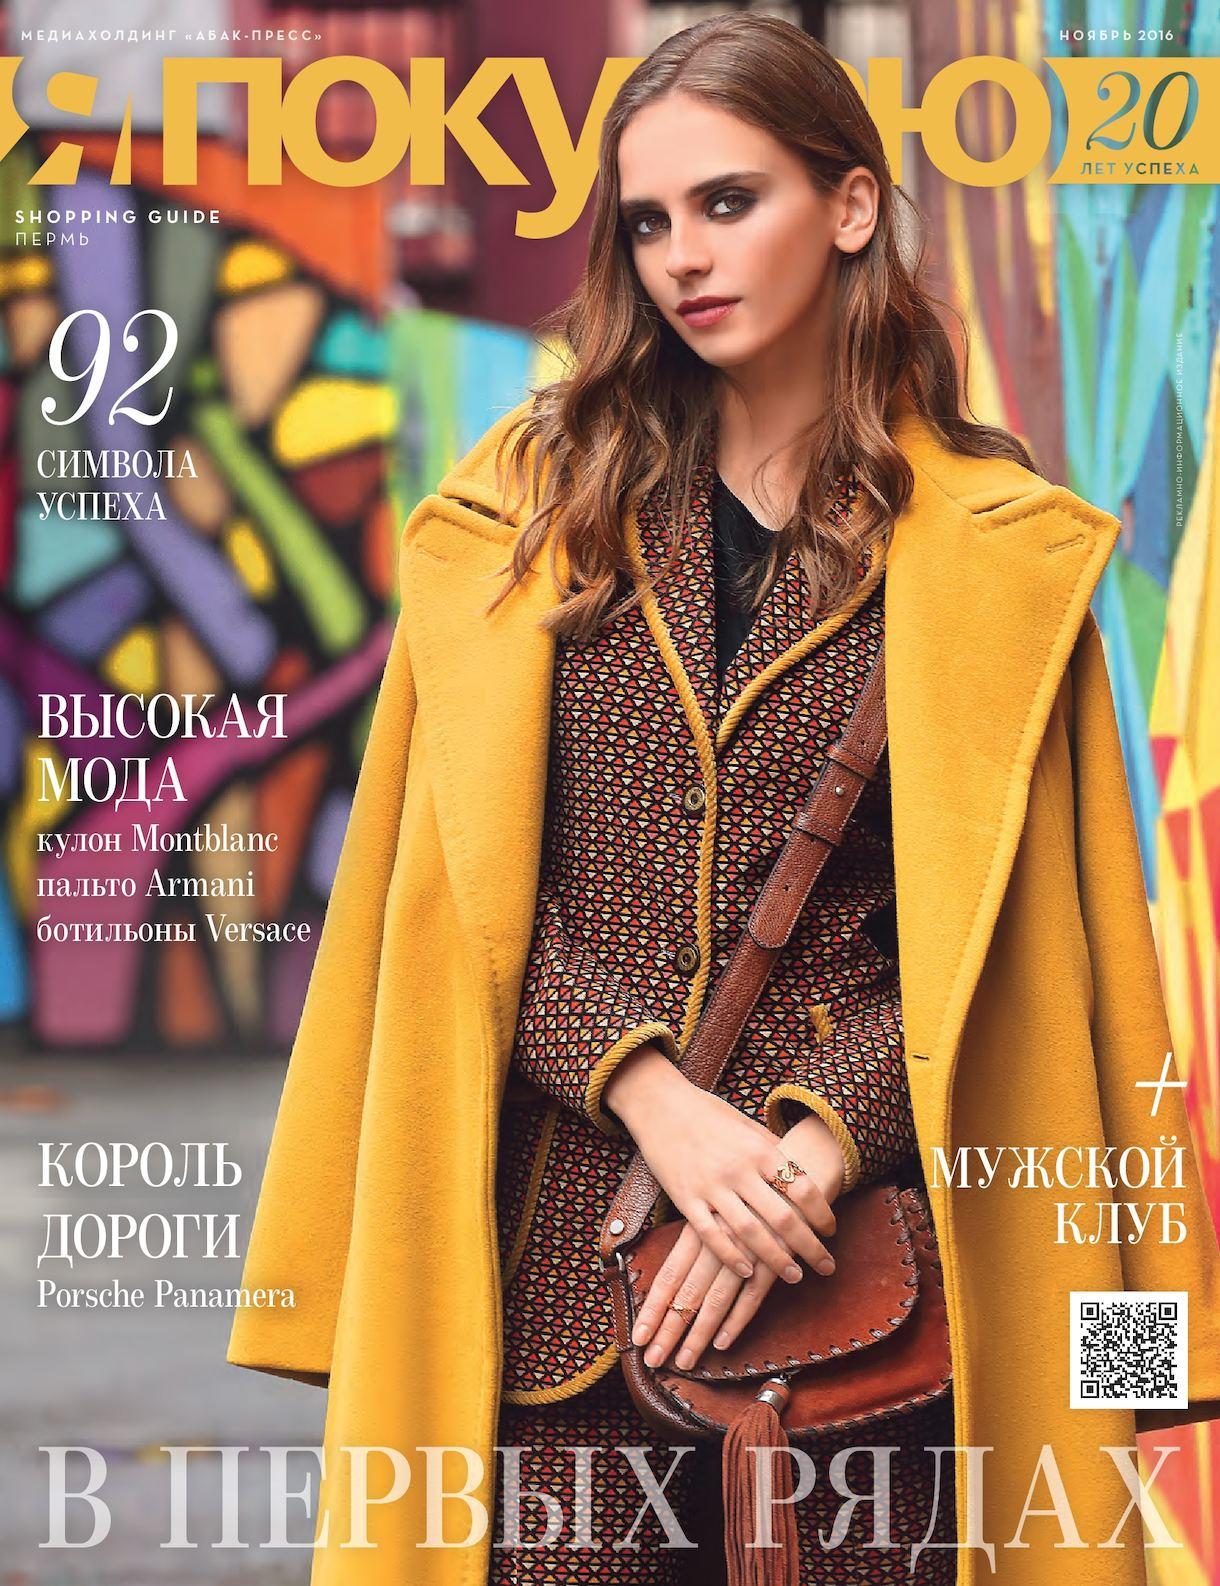 bcf6e94f99476d5 Calaméo - Shopping Guide «Я Покупаю. Пермь», ноябрь 2016